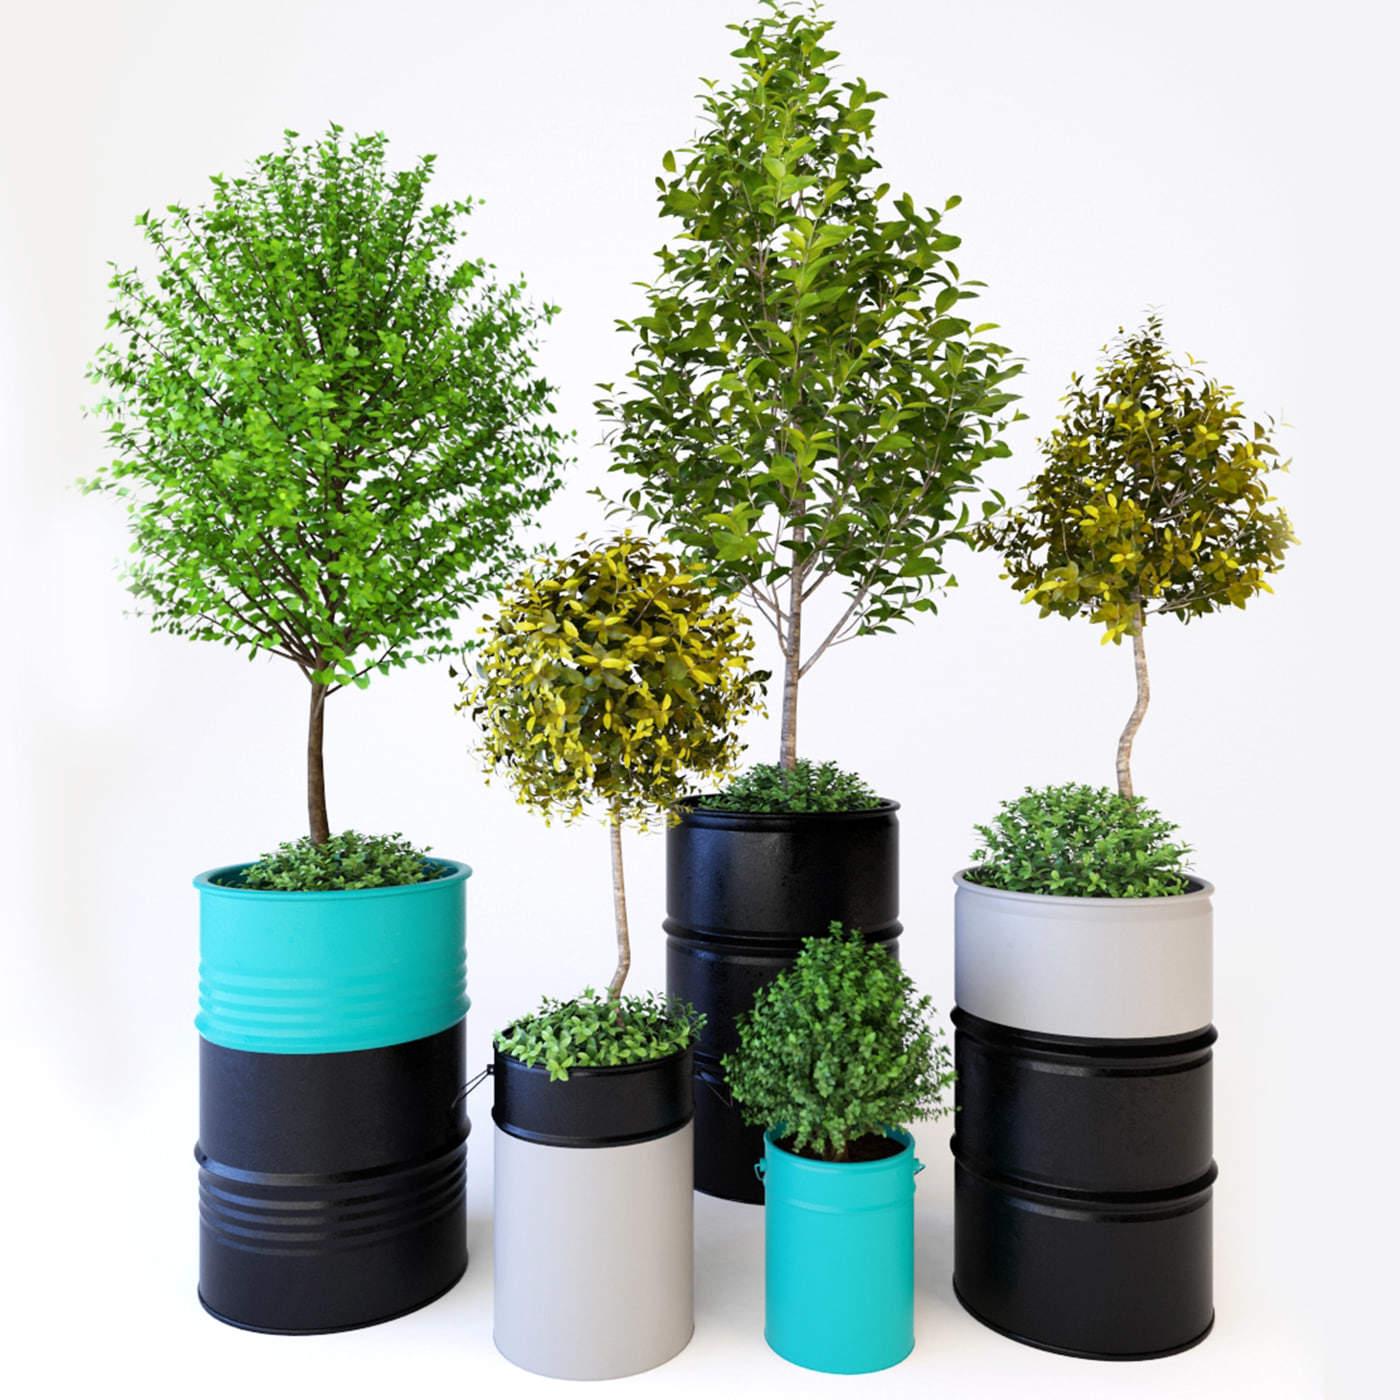 Modelos 3d gratis ccclxix plantas ejezeta for Plantas decorativas tipos